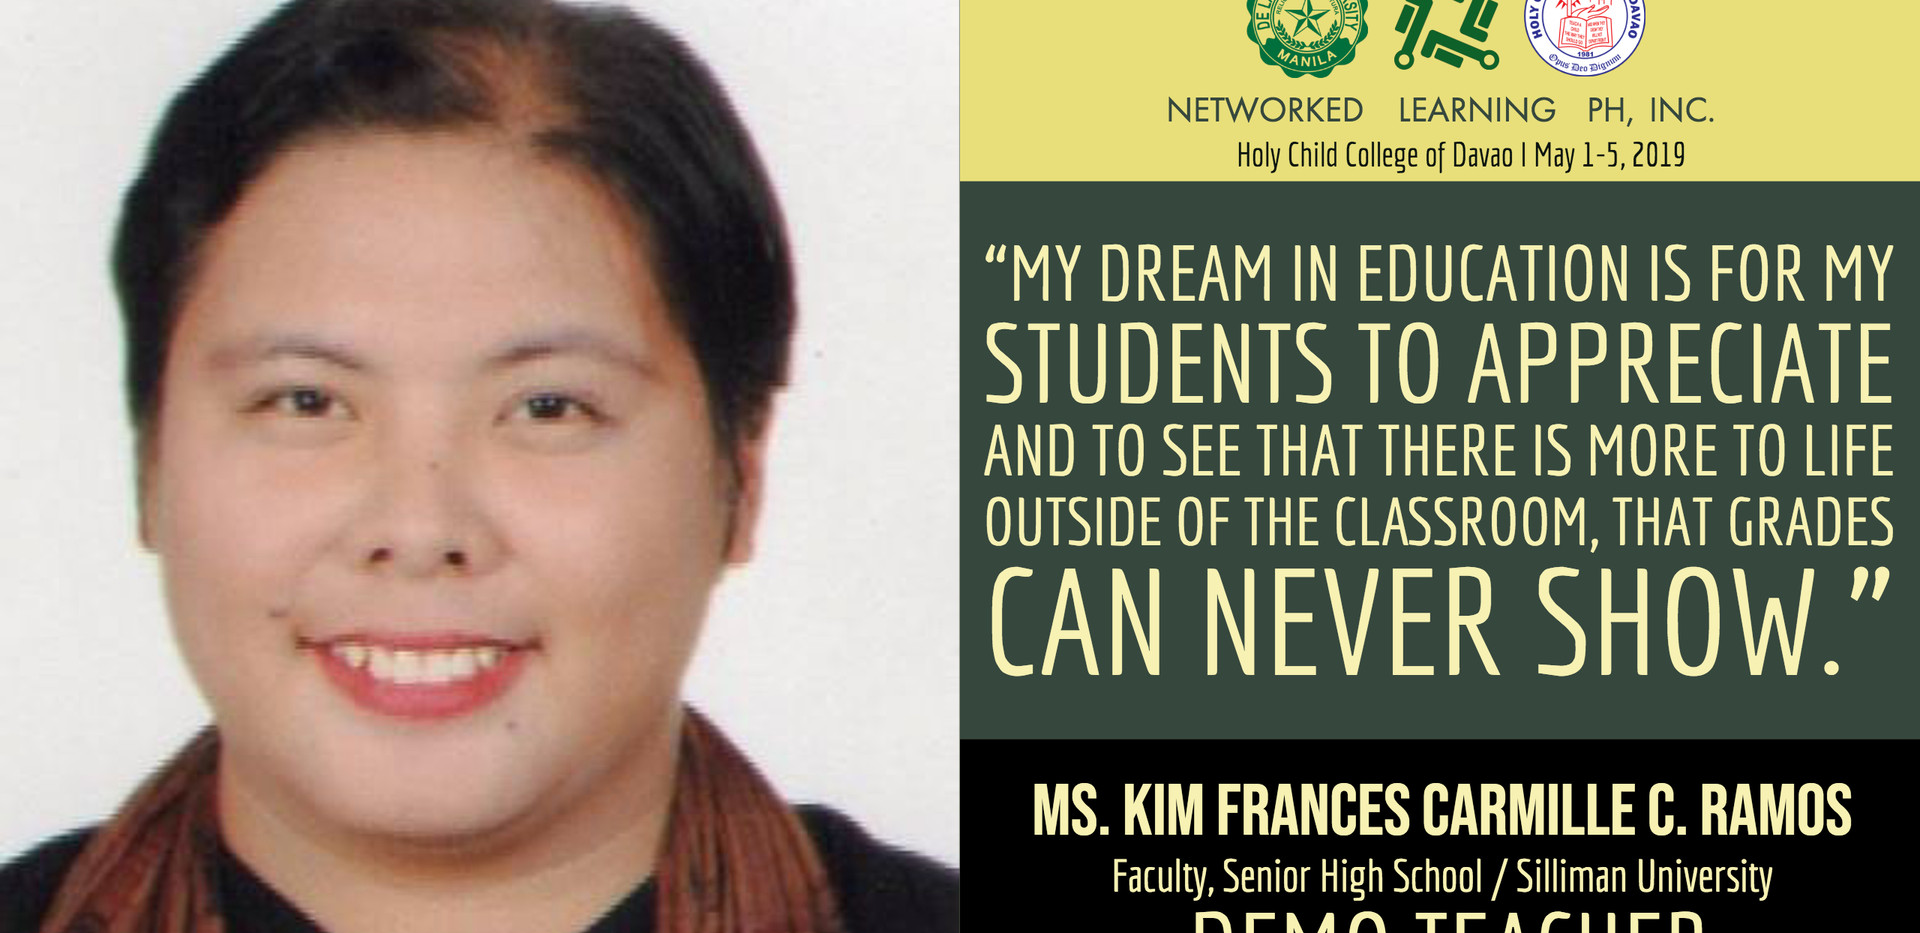 Ms. Kim Frances Carmille C. Ramos